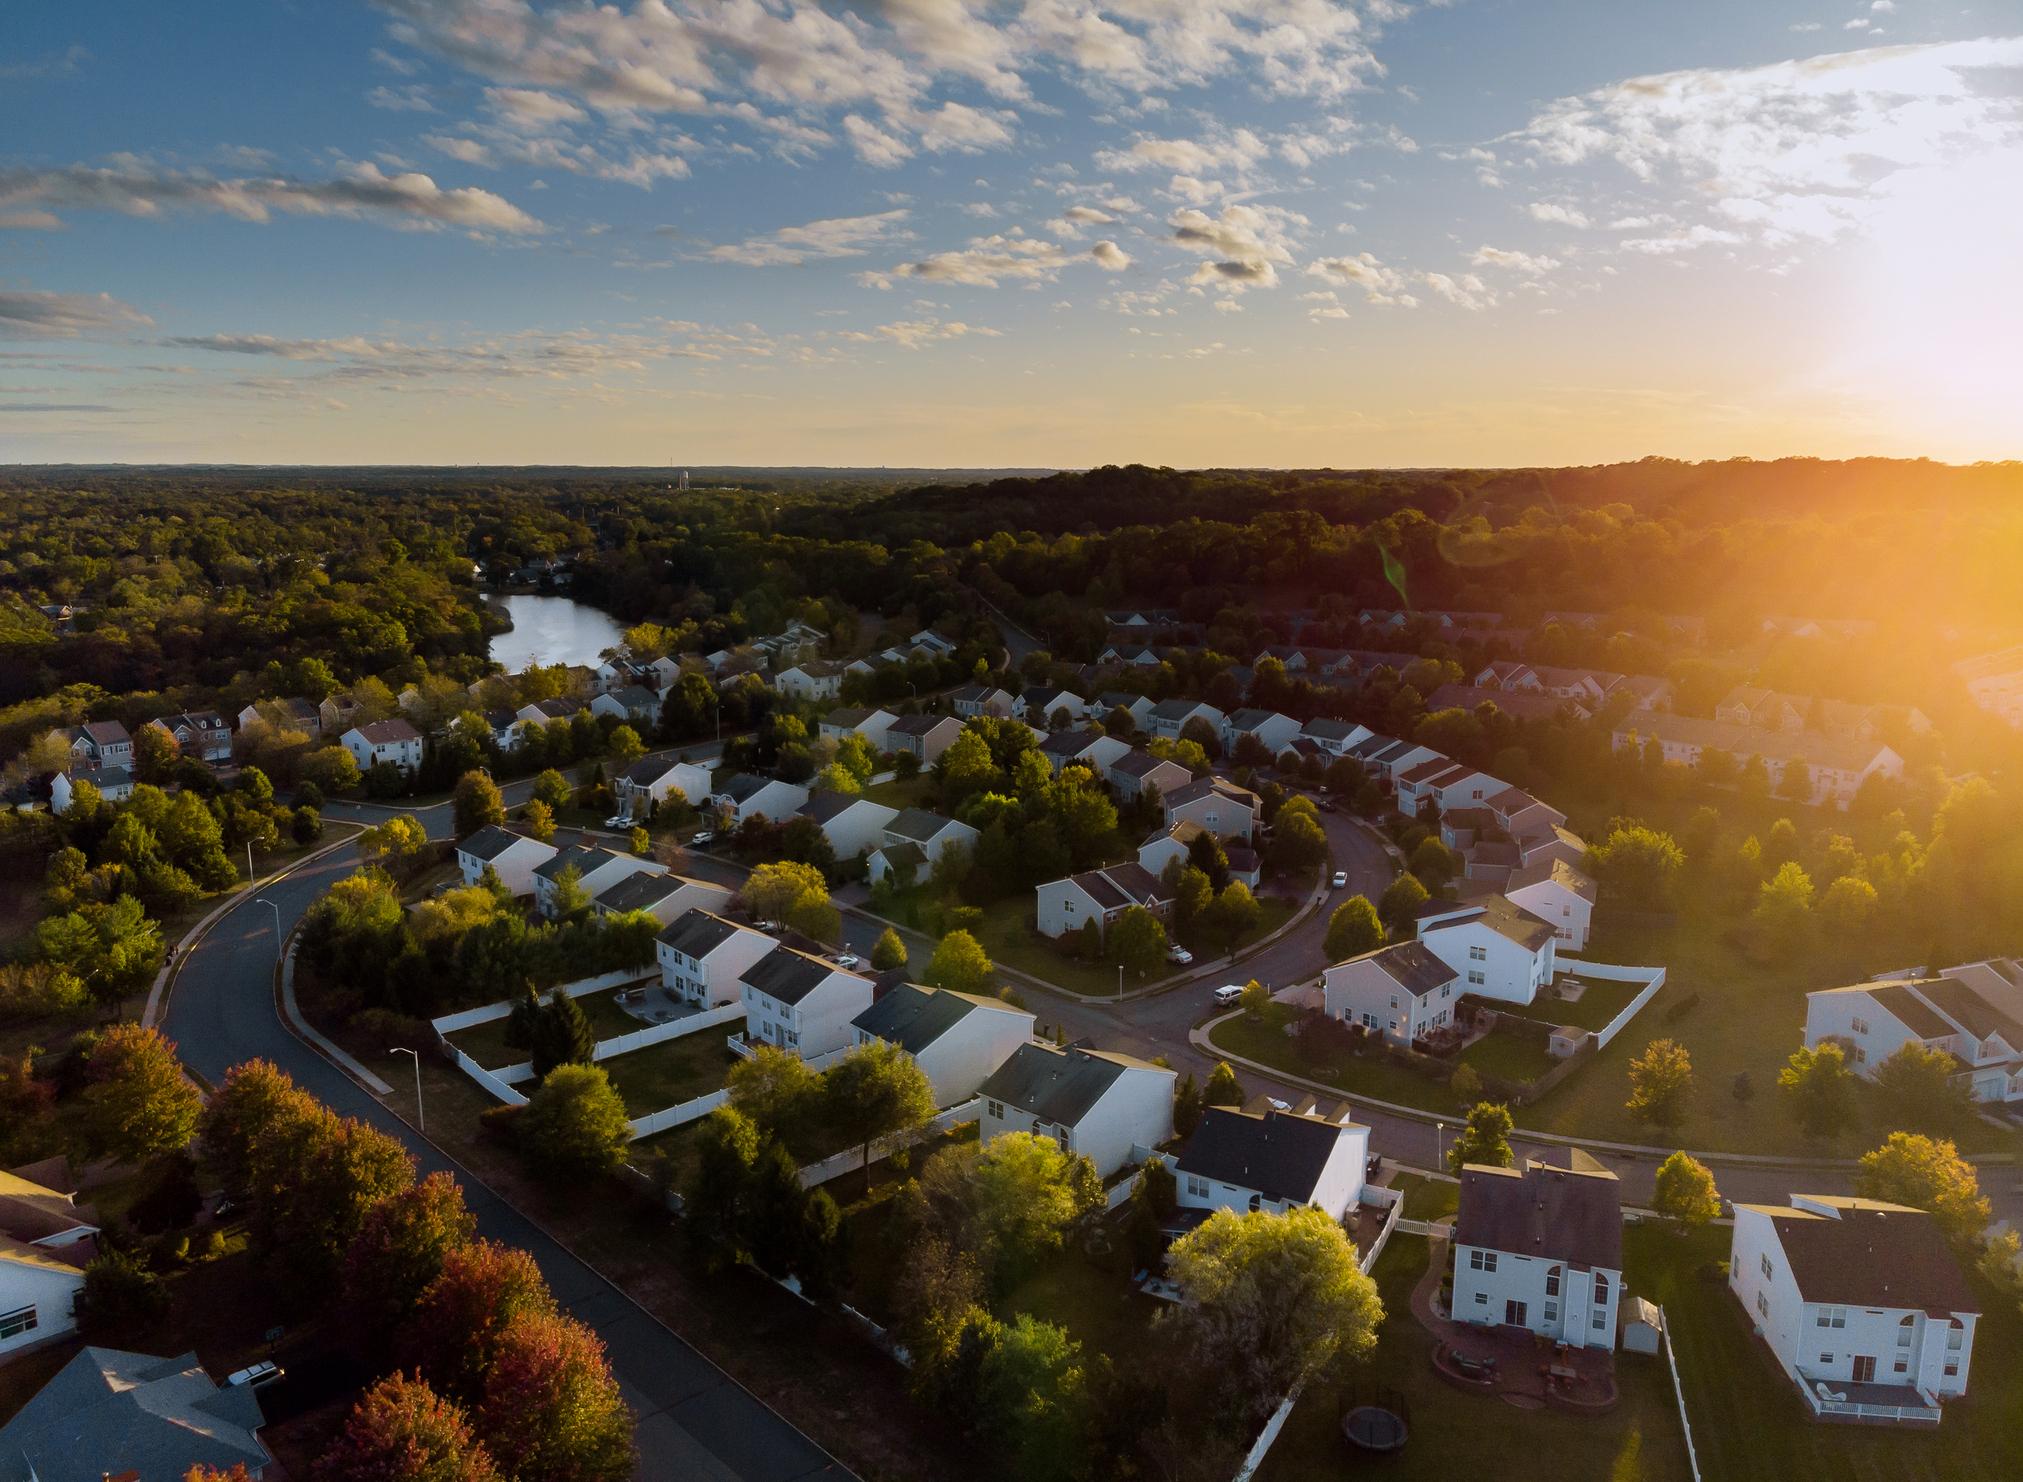 Sun rising over a suburban neighborhood with lush green trees.